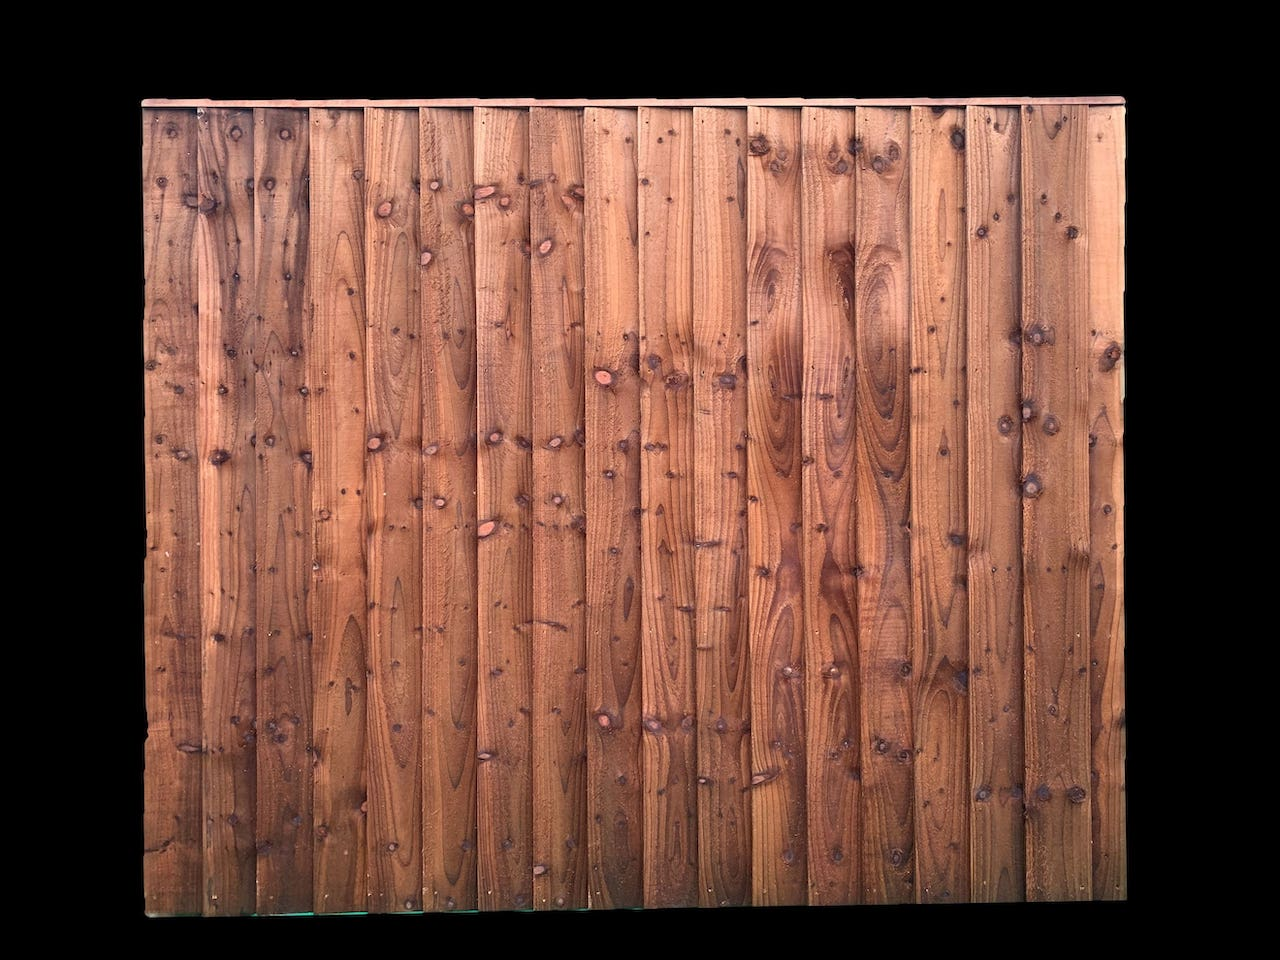 Garden Fence Panels in Eccleston